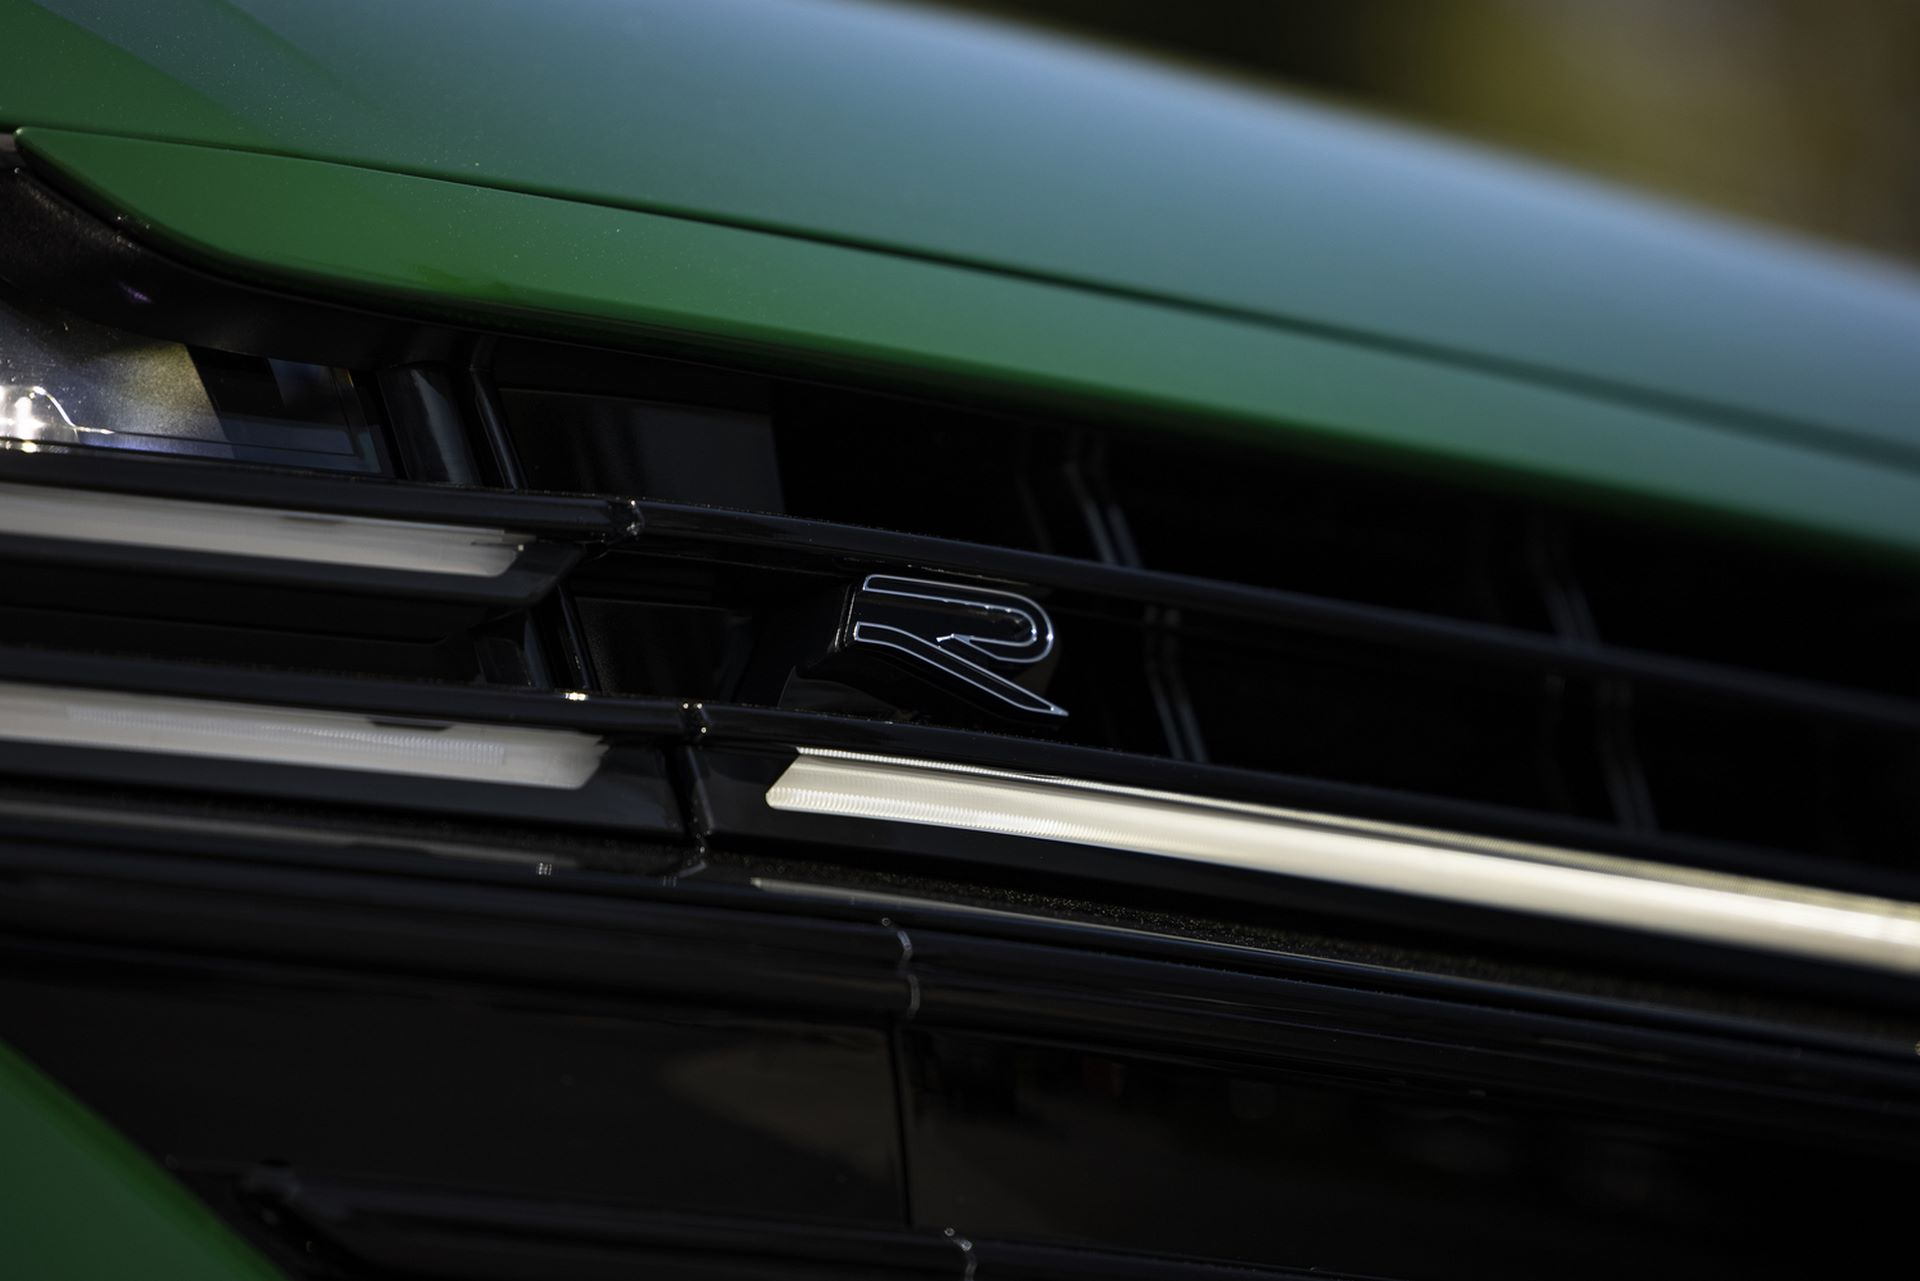 VW-Volkswagen-Arteon-Big-Sur-concept-6